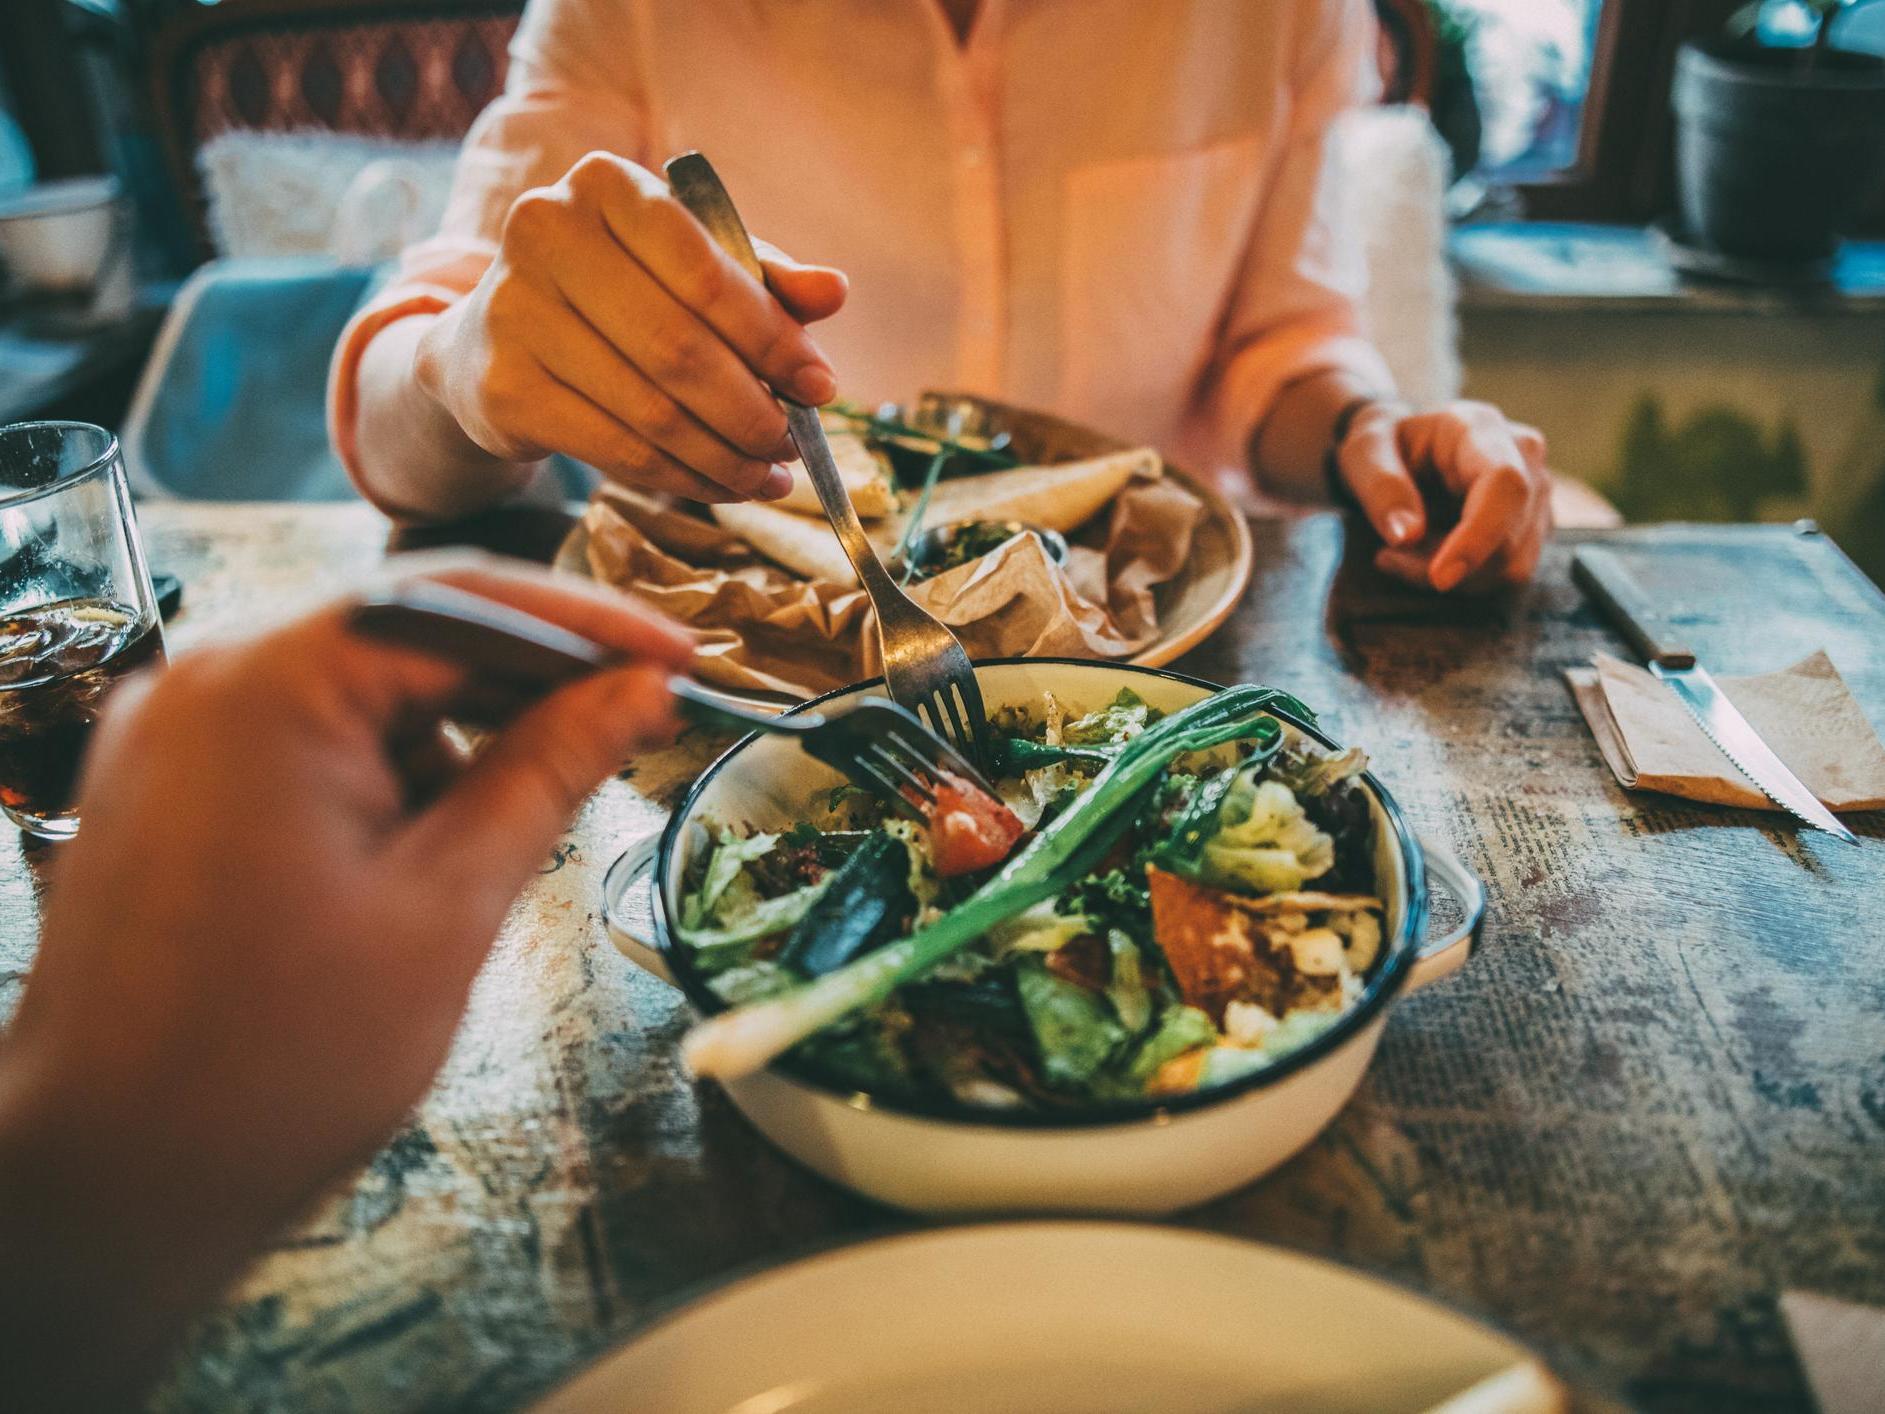 Some vegan meals contain more salt than seven McDonald's hamburgers, study finds